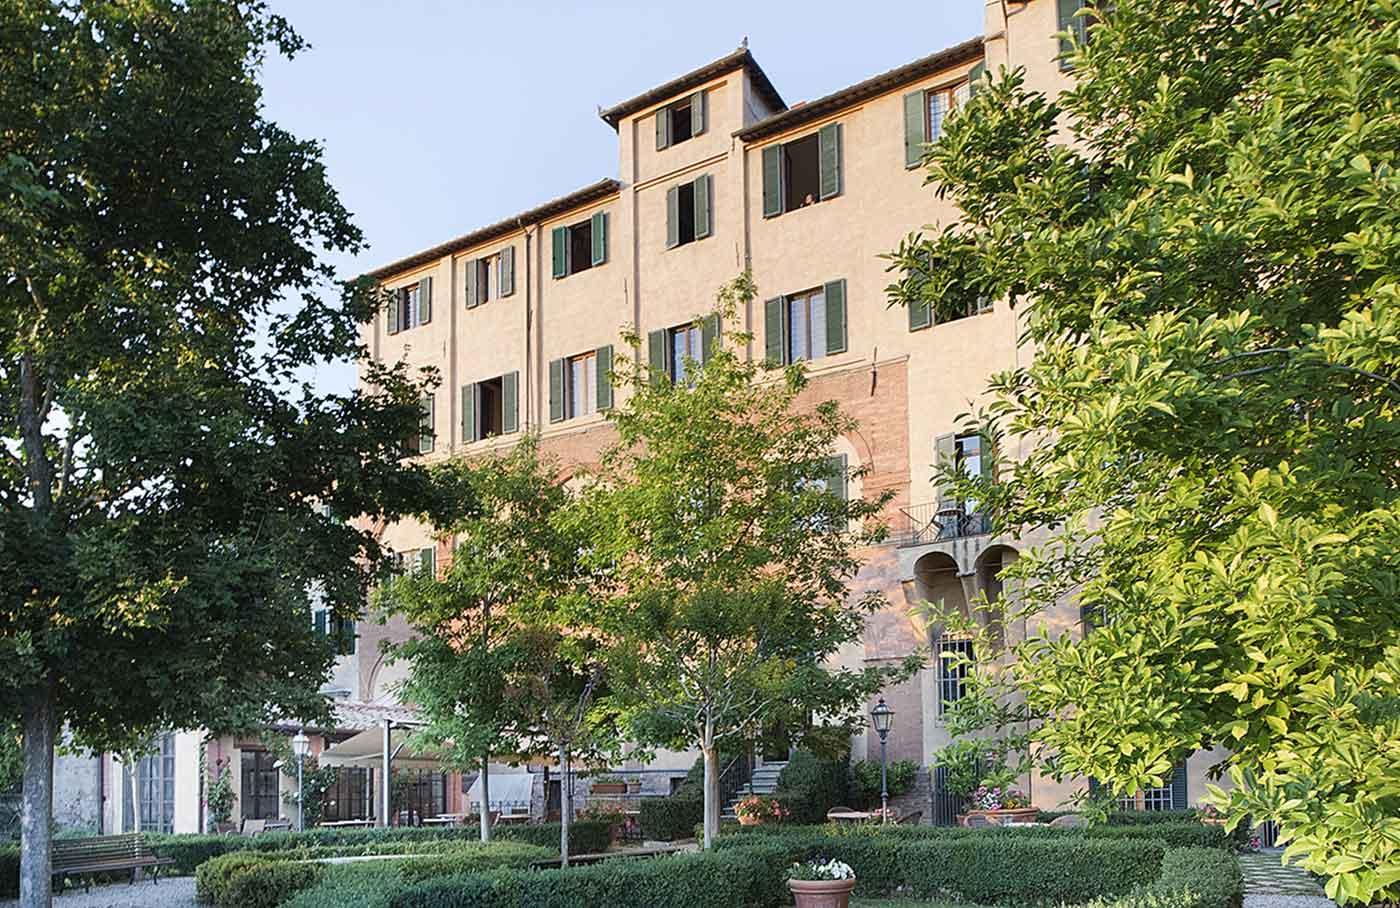 Accommodation siena italy hotel palazzo ravizza relais for Accomodation siena